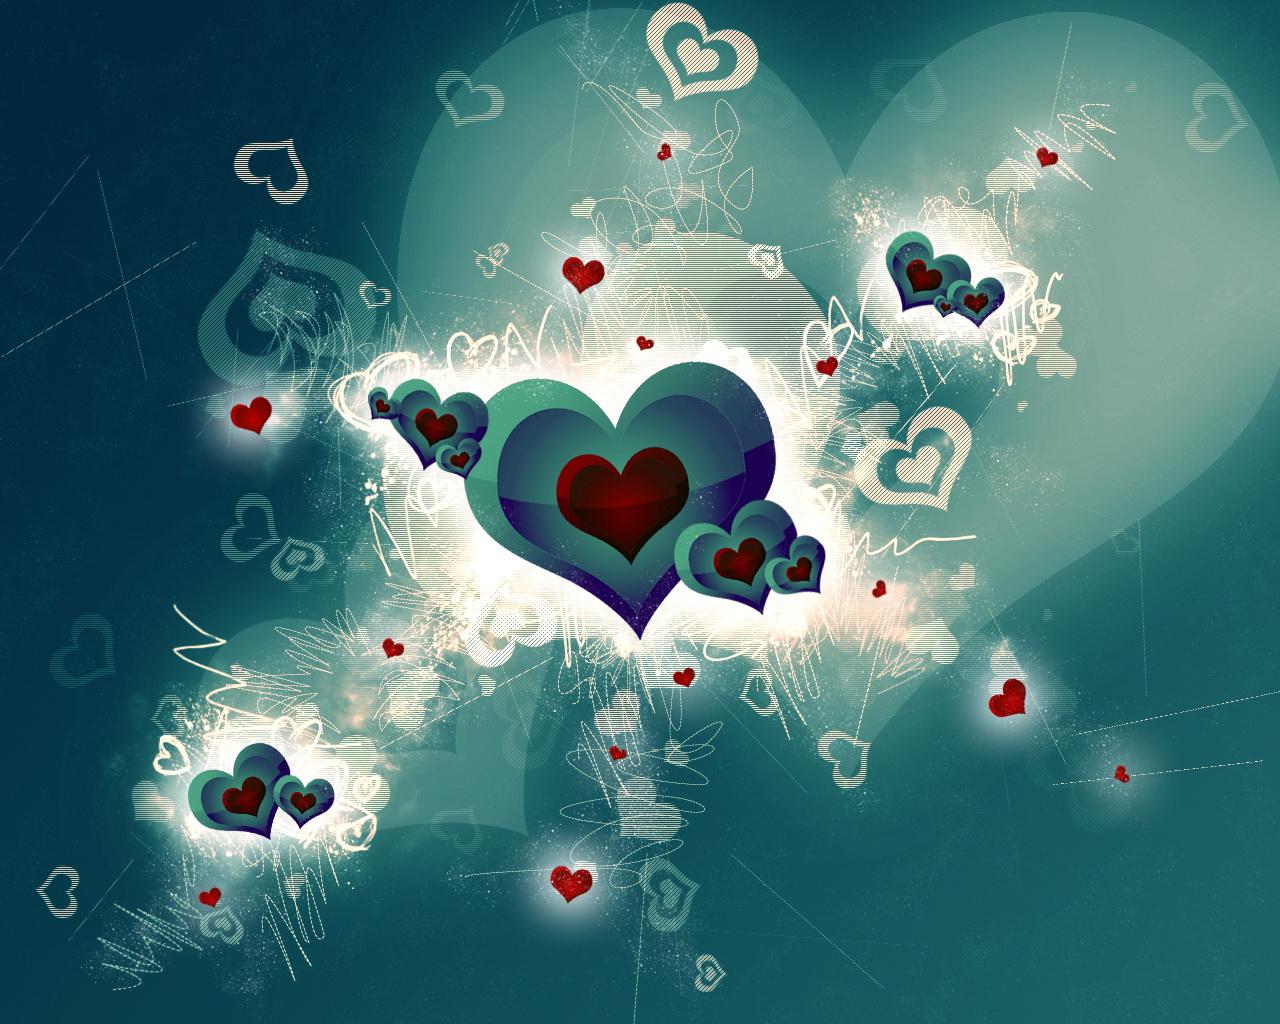 http://3.bp.blogspot.com/-bQLypBKIL74/TttSnhBOwhI/AAAAAAAABKU/VE55cysQ8FU/s1600/desktop-wallpapers.jpg